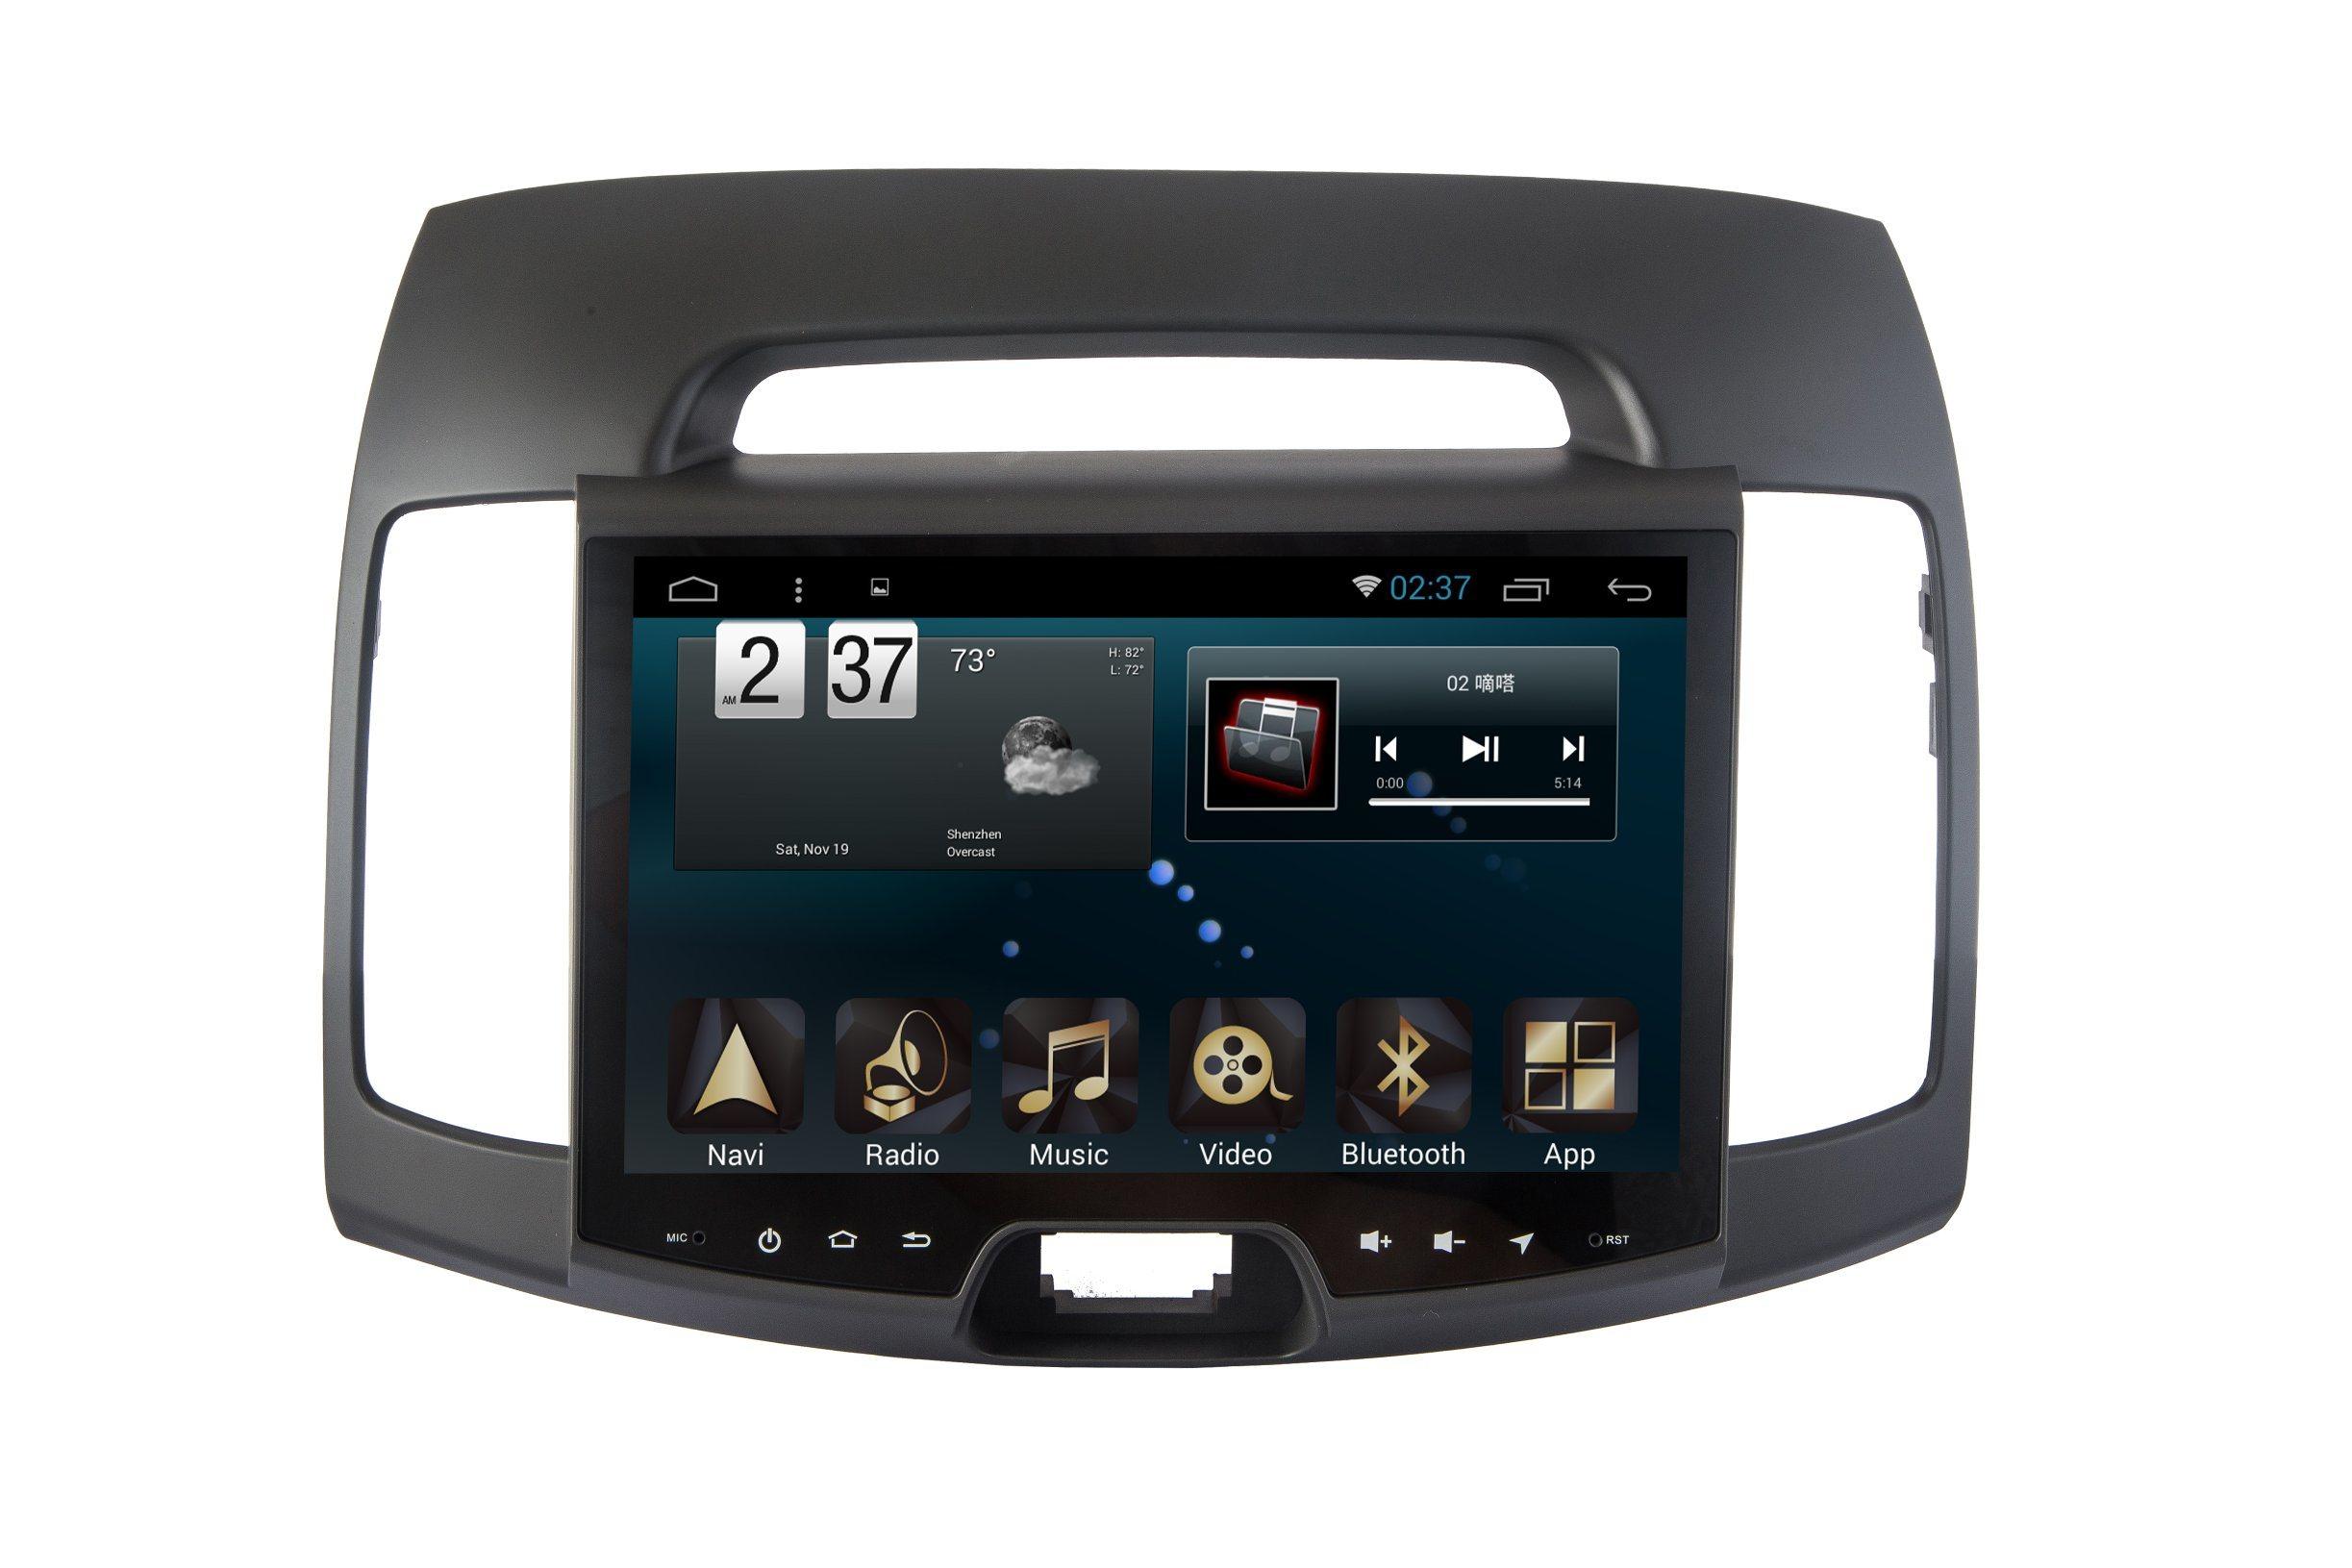 New Ui Android 6.0 Car Player for Hyundai Elantra 2015 with Car GPS